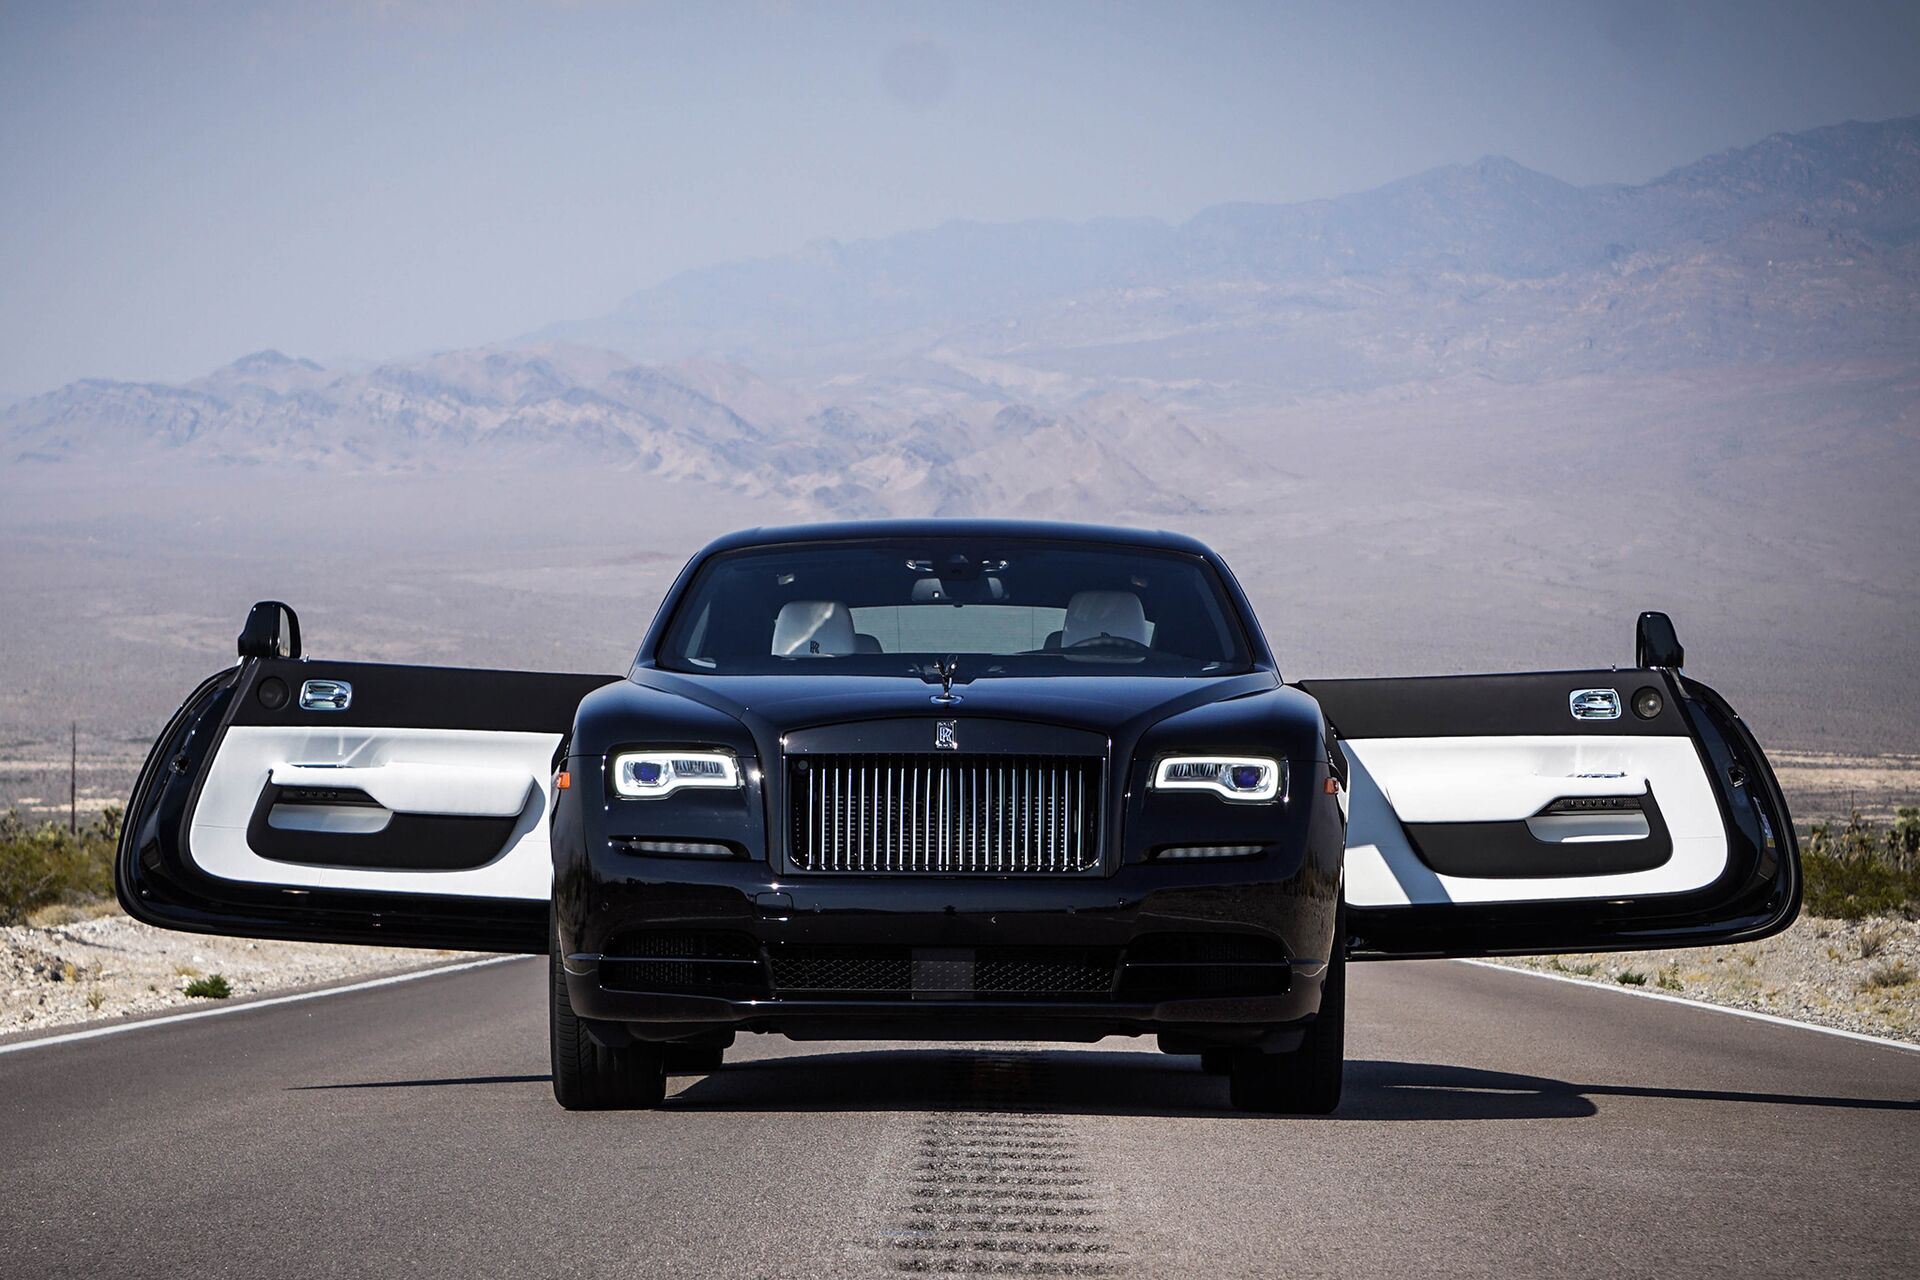 Aston Martin Bentley Lotus Rolls Royce Dealership